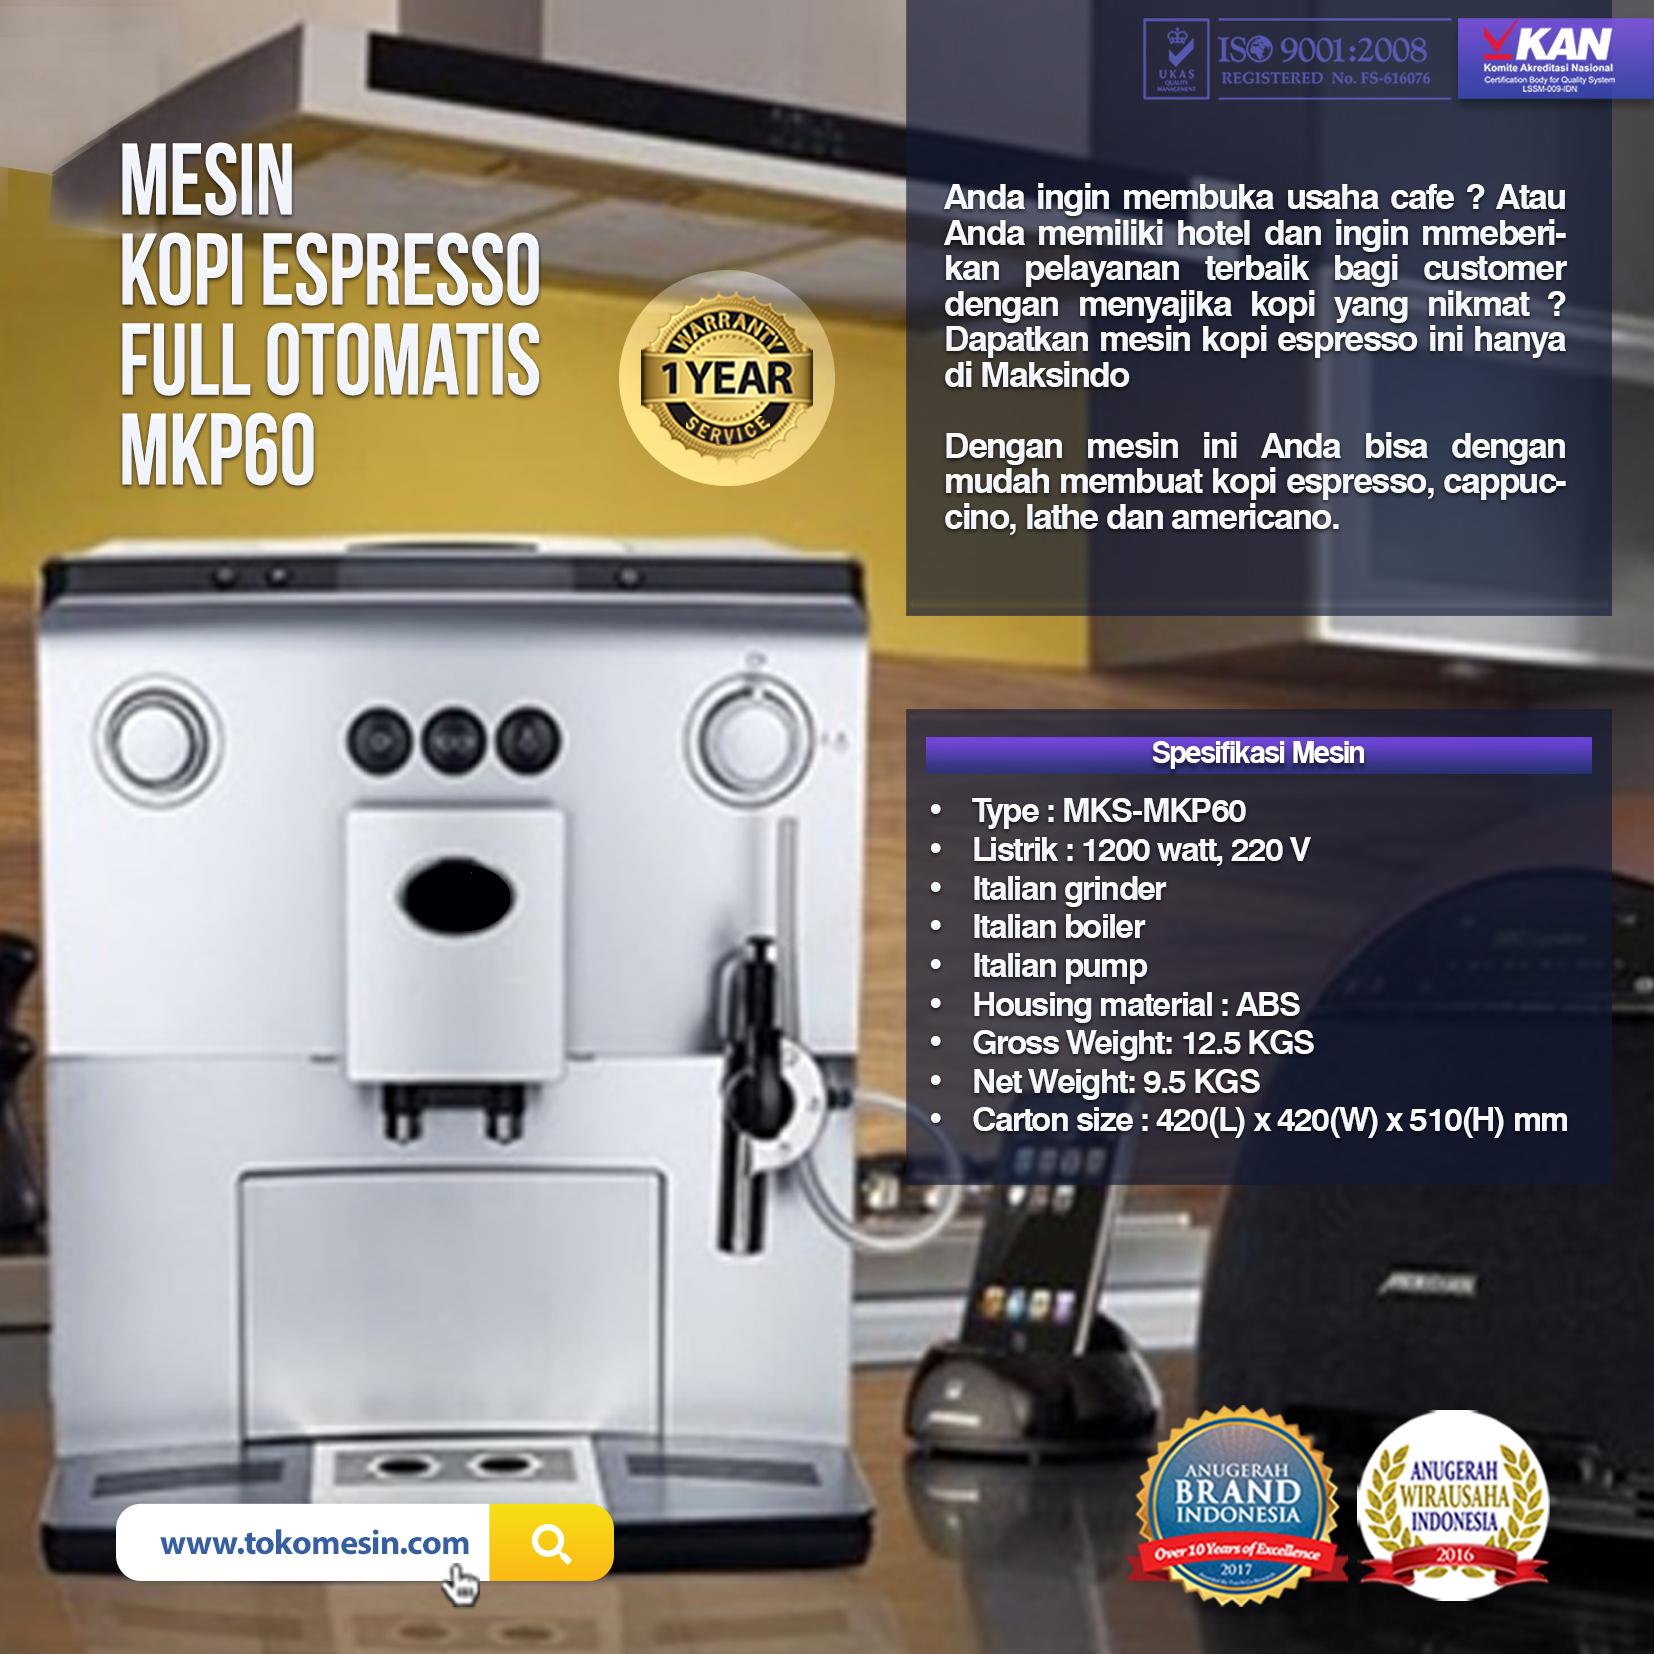 Mesin Kopi Espresso Full Otomatis MKP60